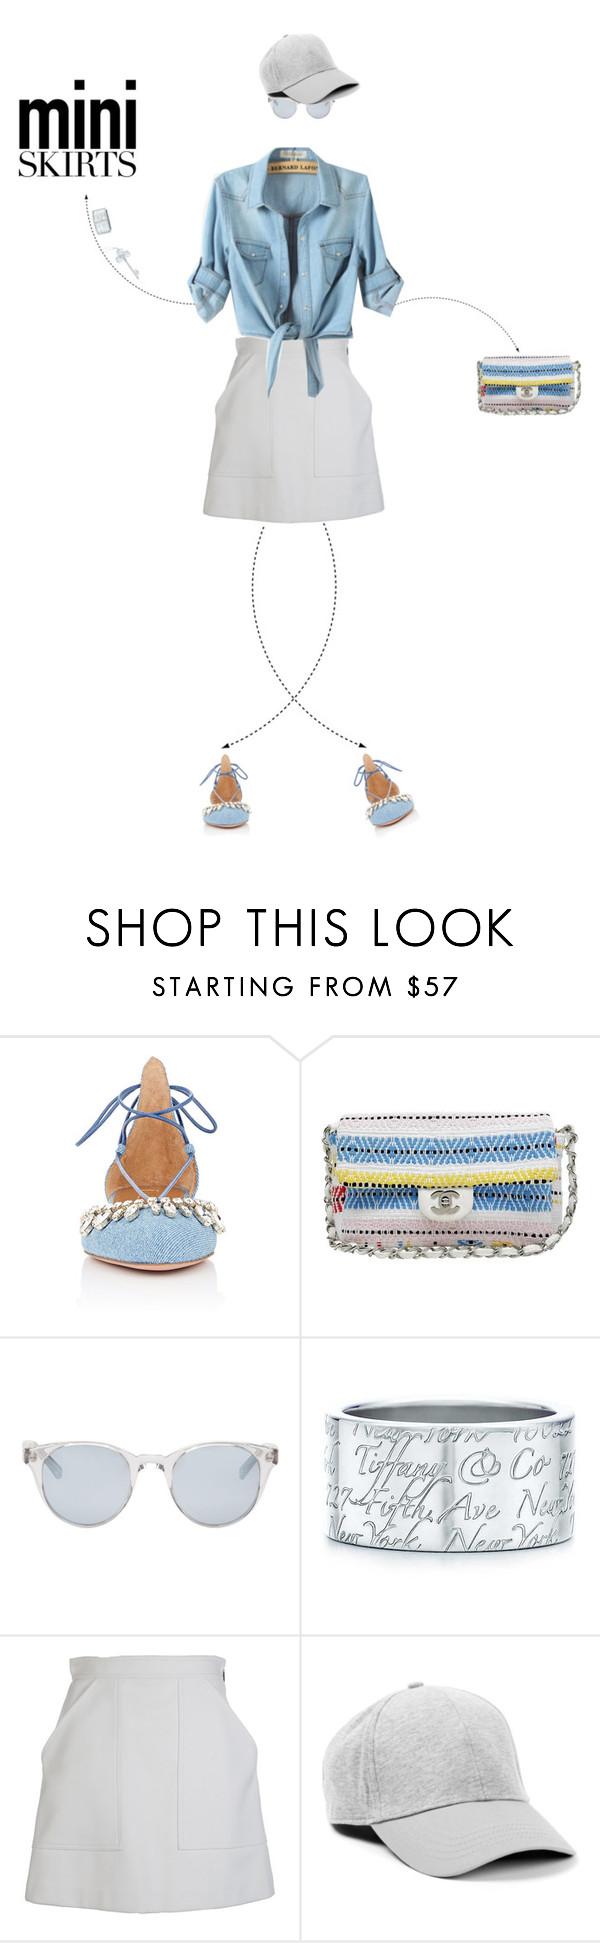 """Mini Skirt Doll"" by christine-sacco ❤ liked on Polyvore featuring Aquazzura, Chanel, Sun Buddies, Tiffany & Co., MSGM and MINISKIRT"